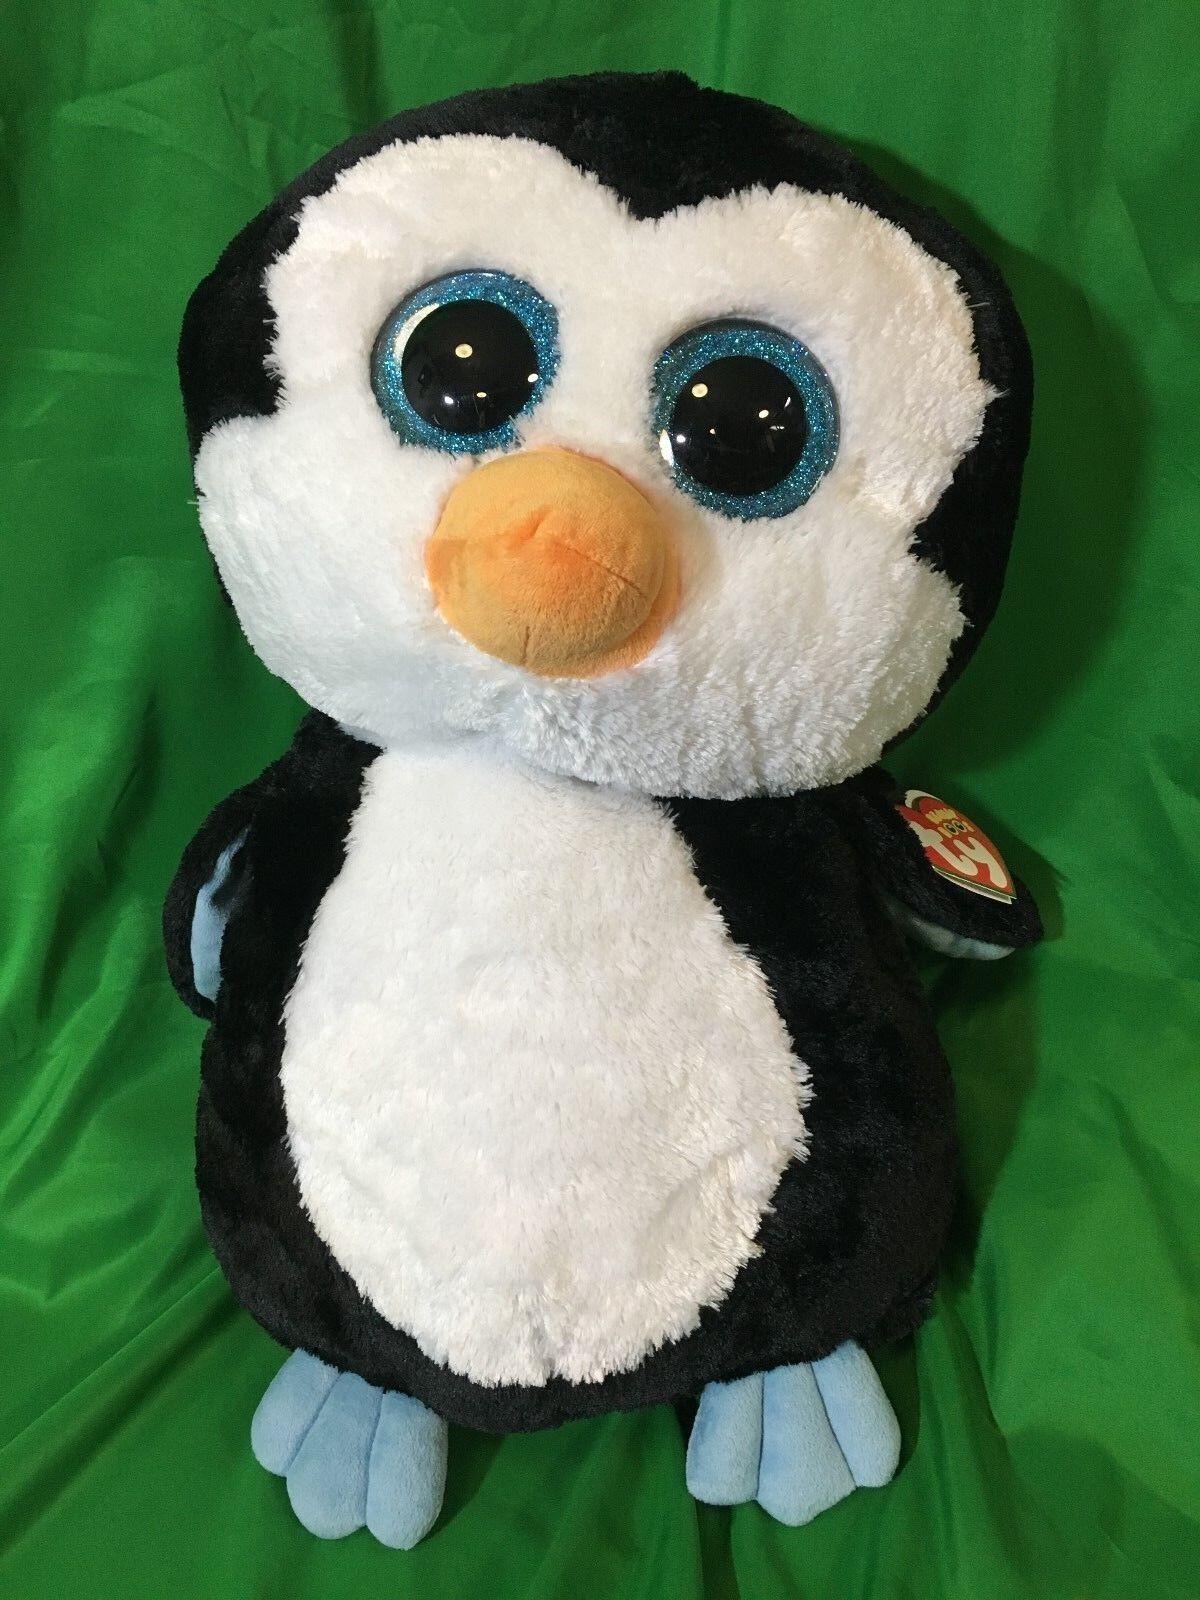 Neue jumbo - 17  ty mütze boos boo tapst pinguin extra große große 11. mai